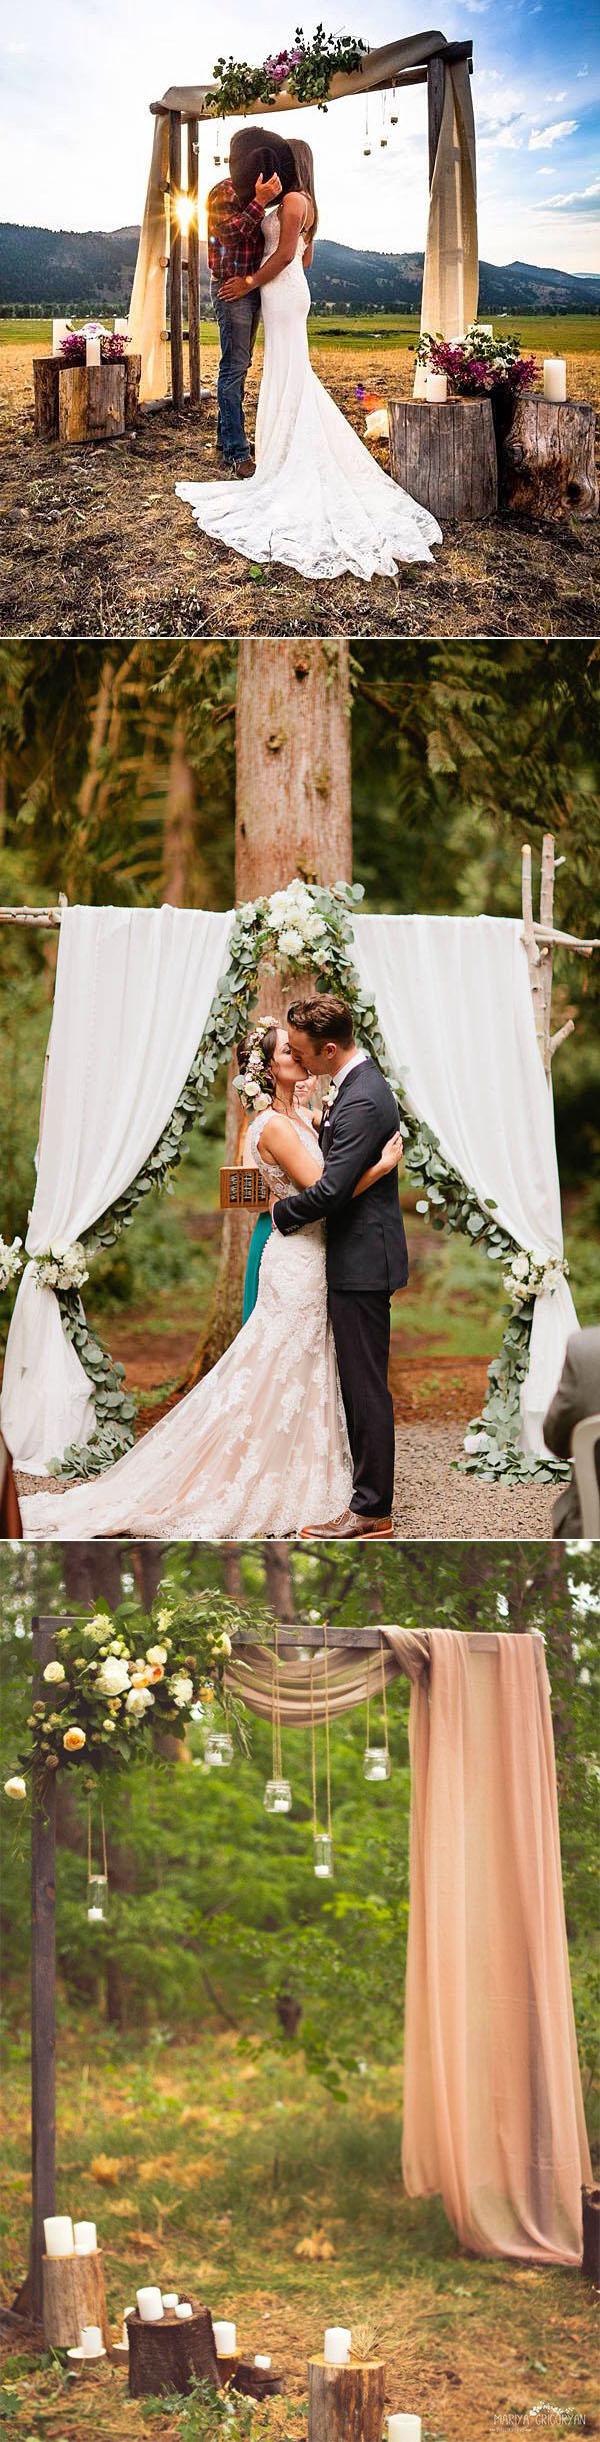 Diy Rustic Wedding 25 Chic And Easy Rustic Wedding Arch Ideas For Diy Brides